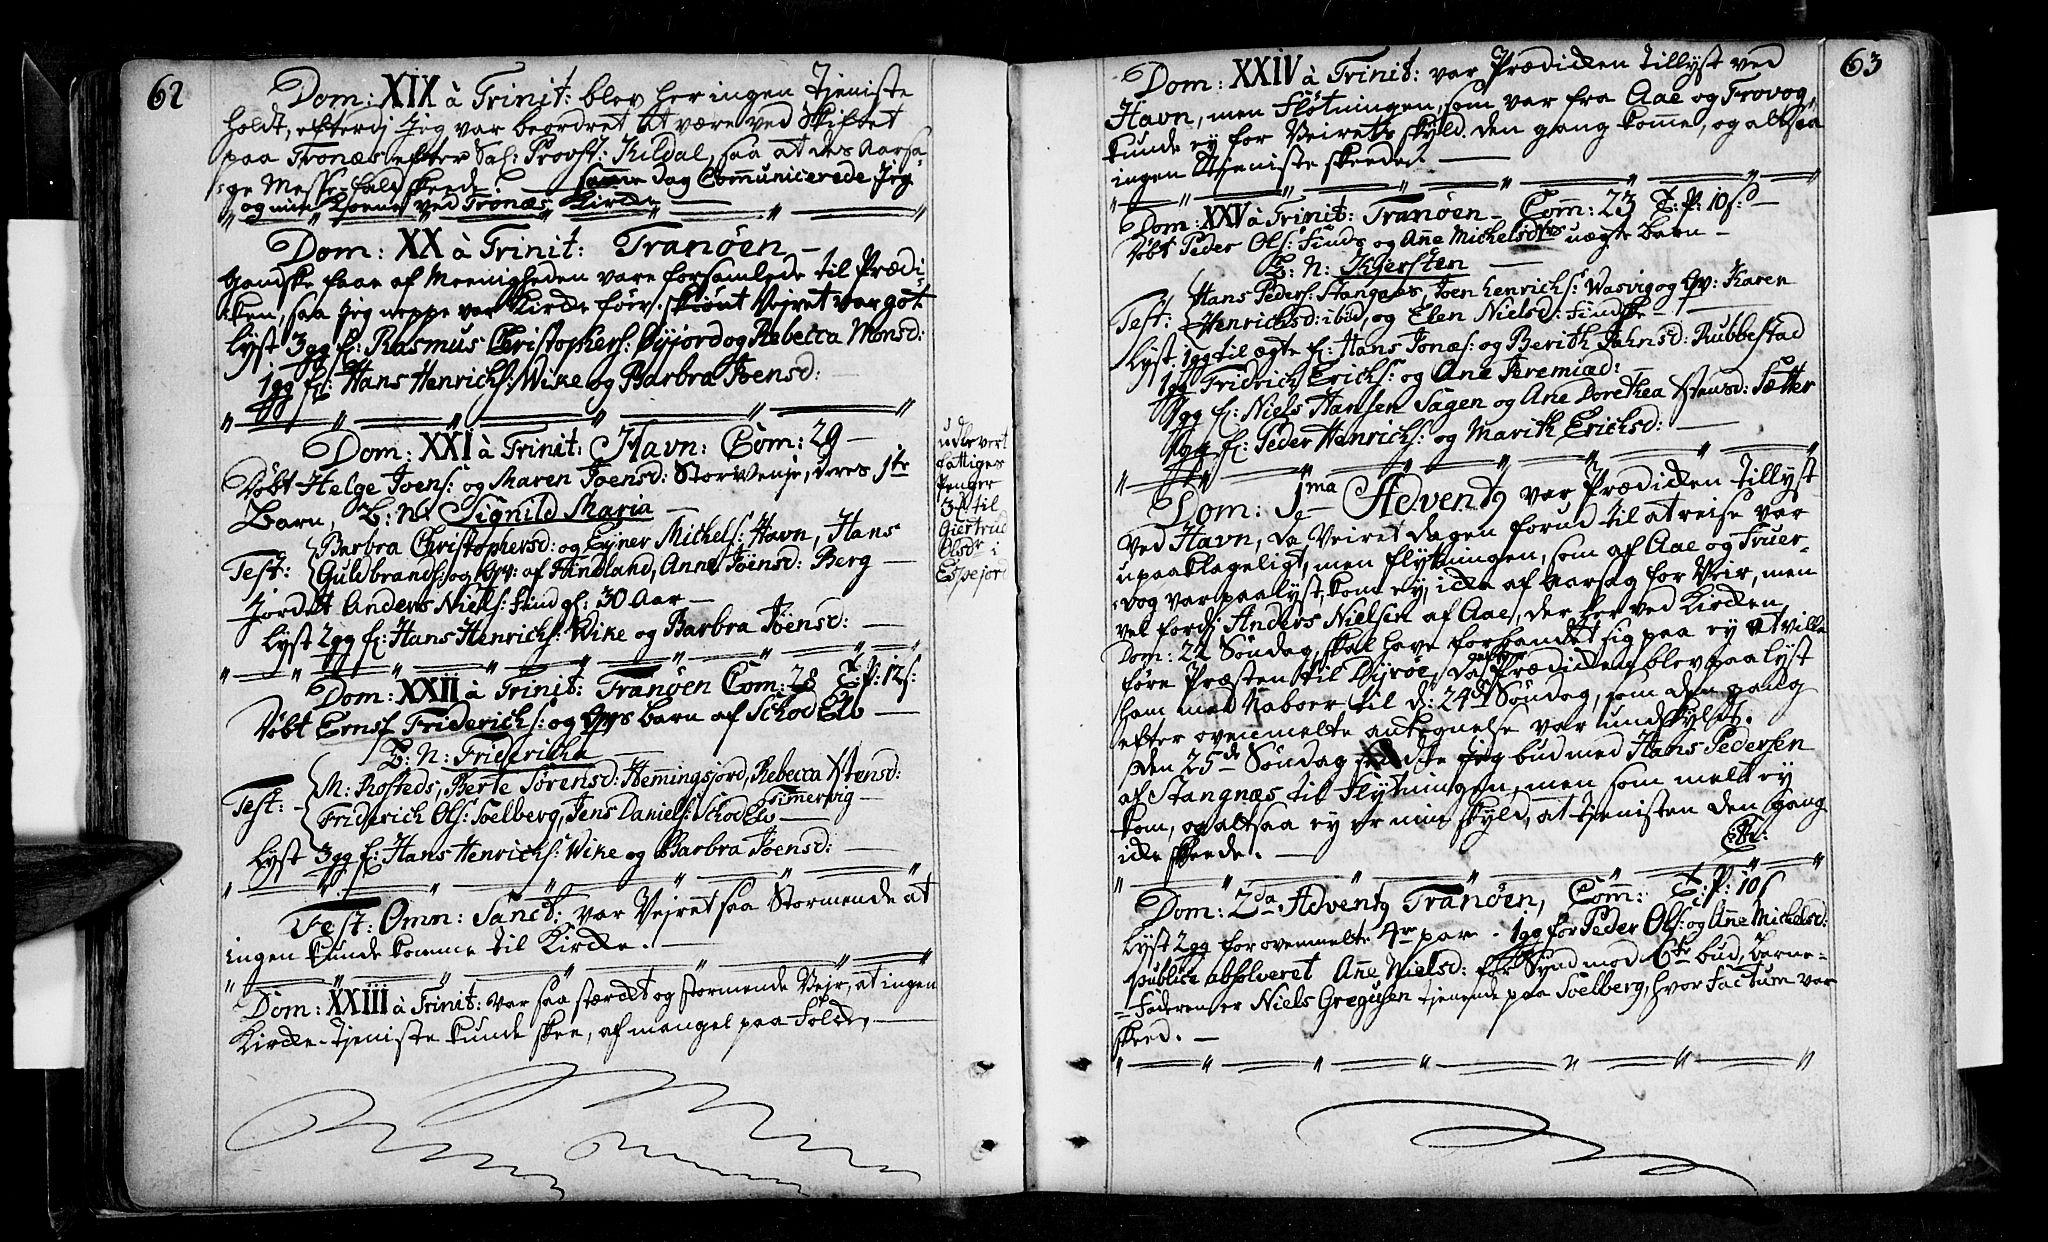 SATØ, Tranøy sokneprestkontor, I/Ia/Iaa/L0001kirke: Ministerialbok nr. 1, 1757-1773, s. 62-63